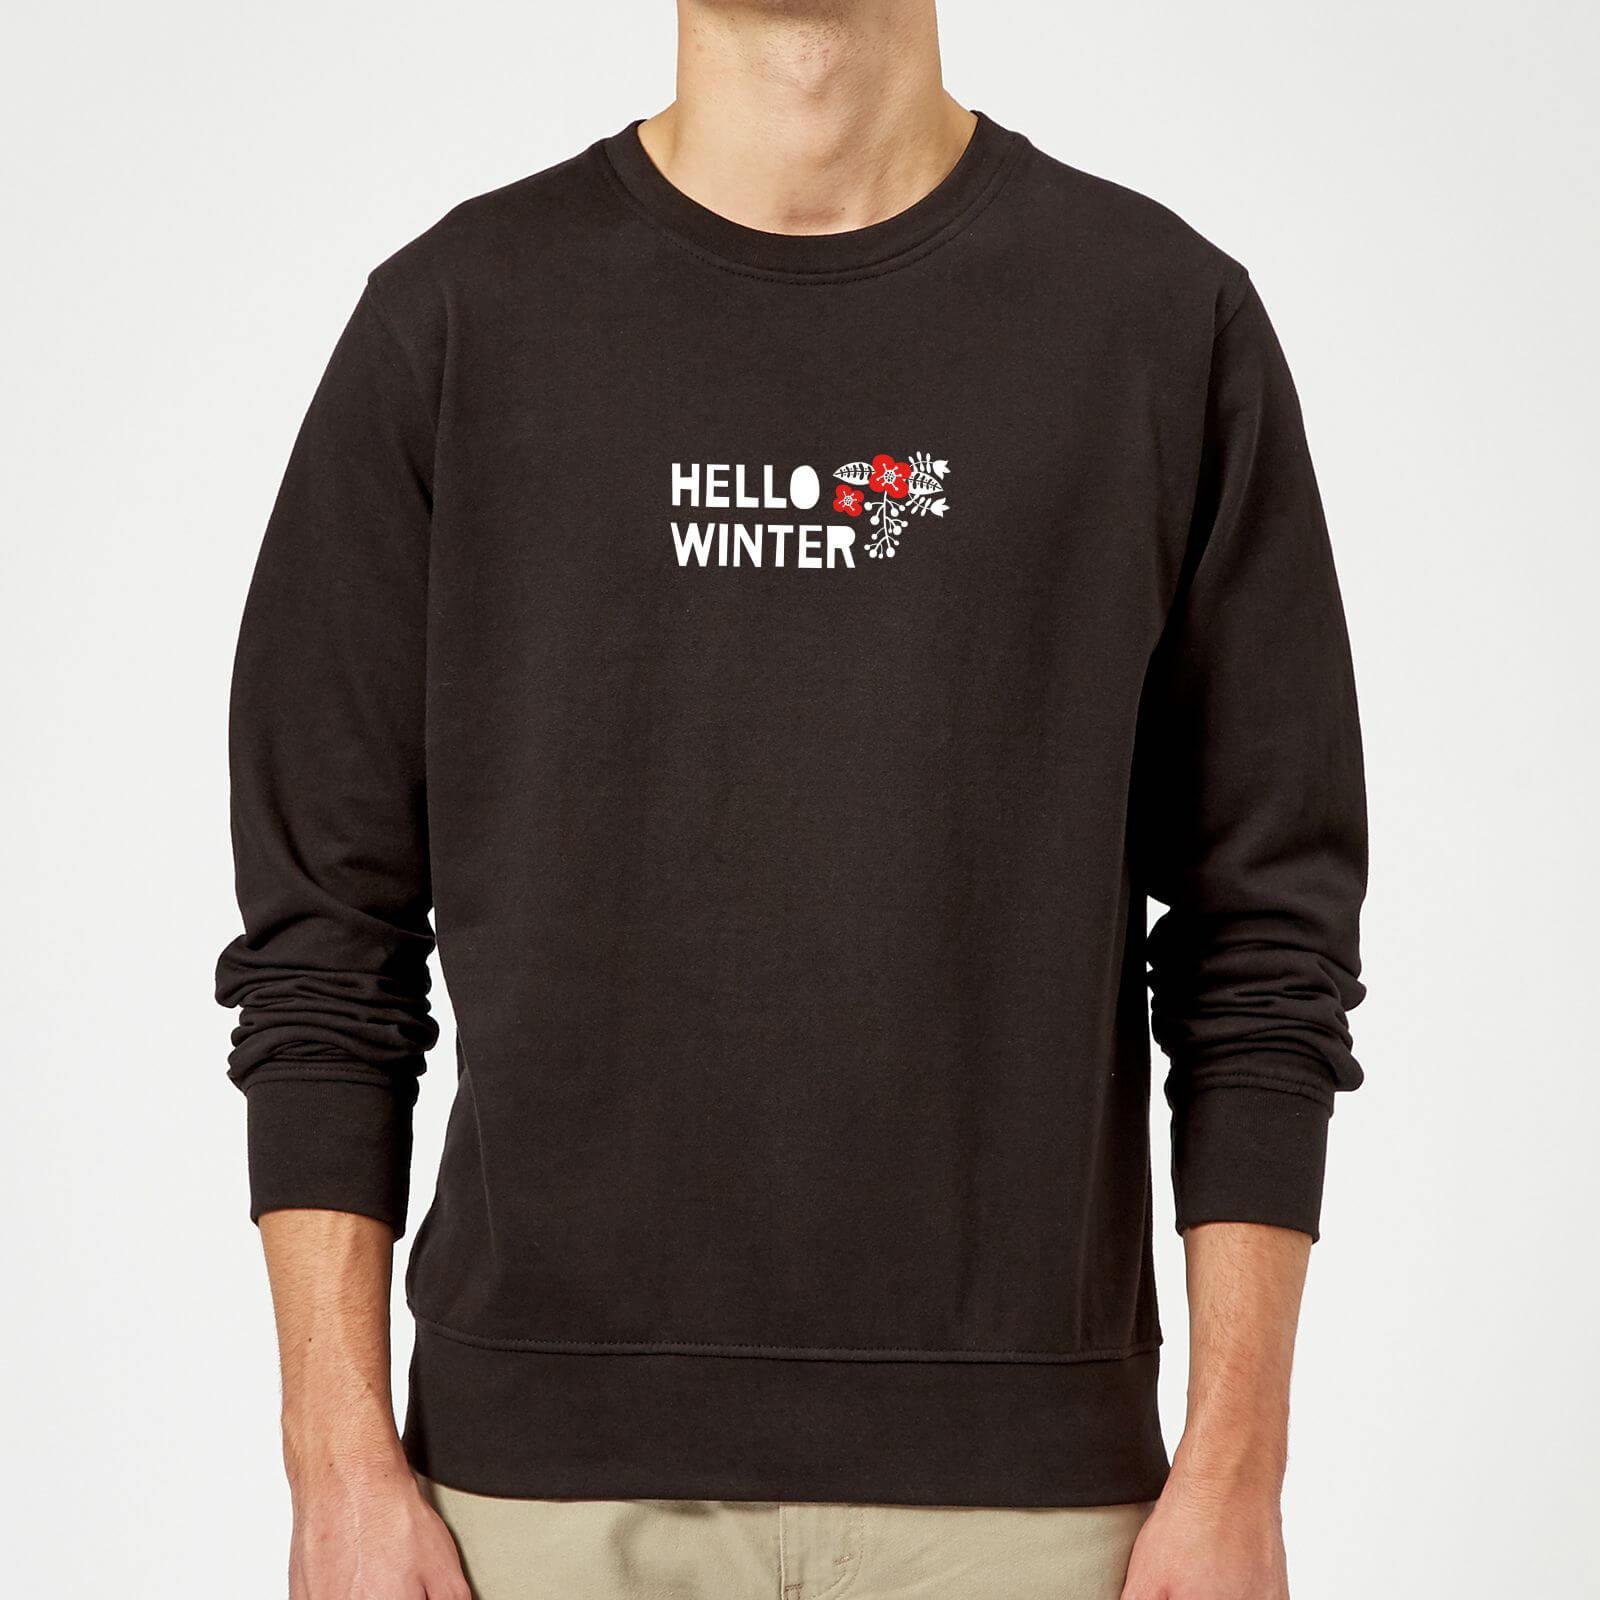 new styles 79704 981b9 Hello Winter Sweatshirt - Black Clothing  Zavvi US